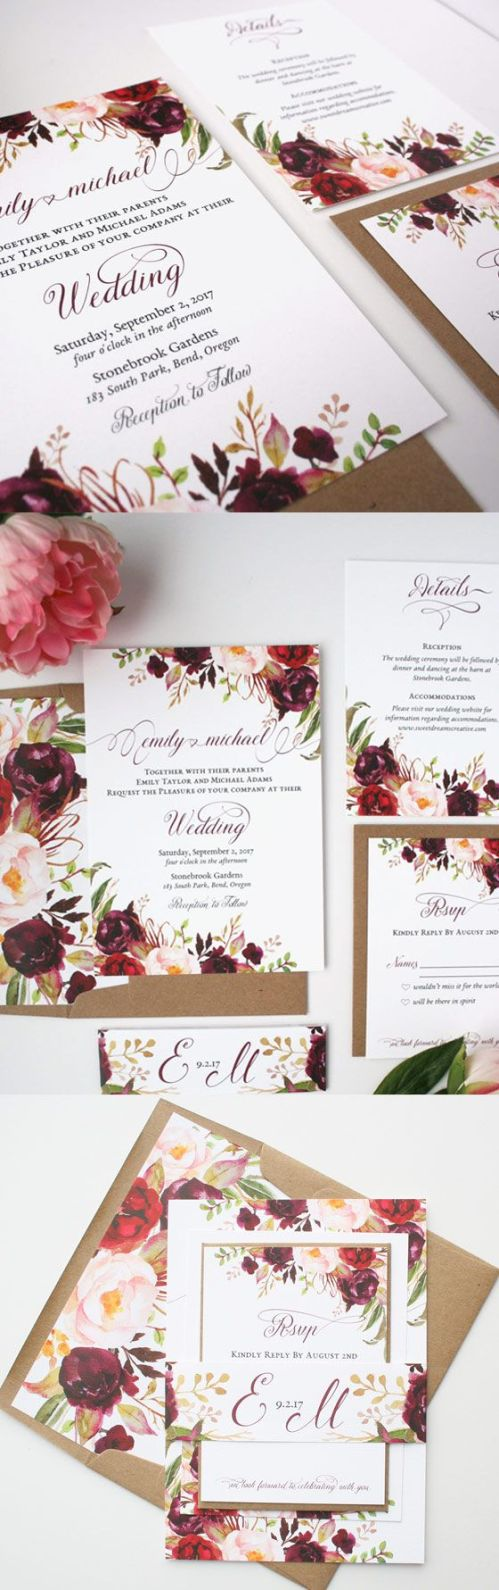 Upscale Fall Wedding Invites Arabia Weddings Fall Wedding Invitations Fall Wedding Invitations Diy